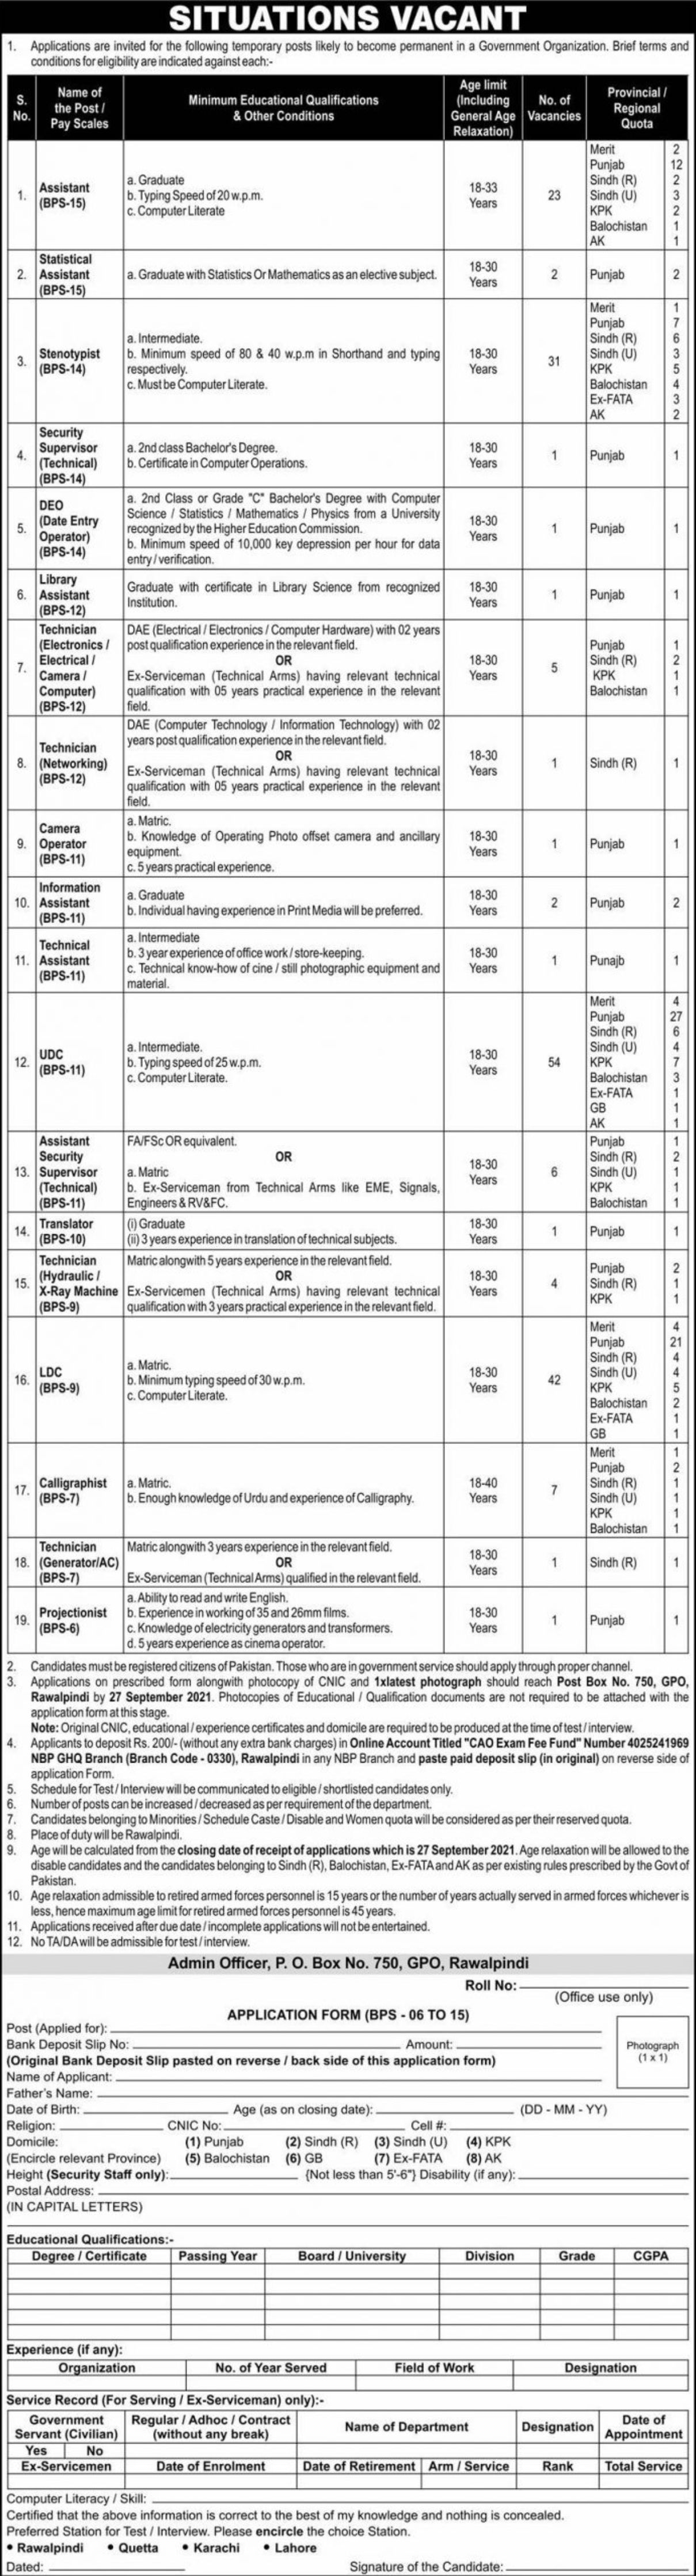 Government Organization Vacancies 2021 – Dailyjobs.pk 3